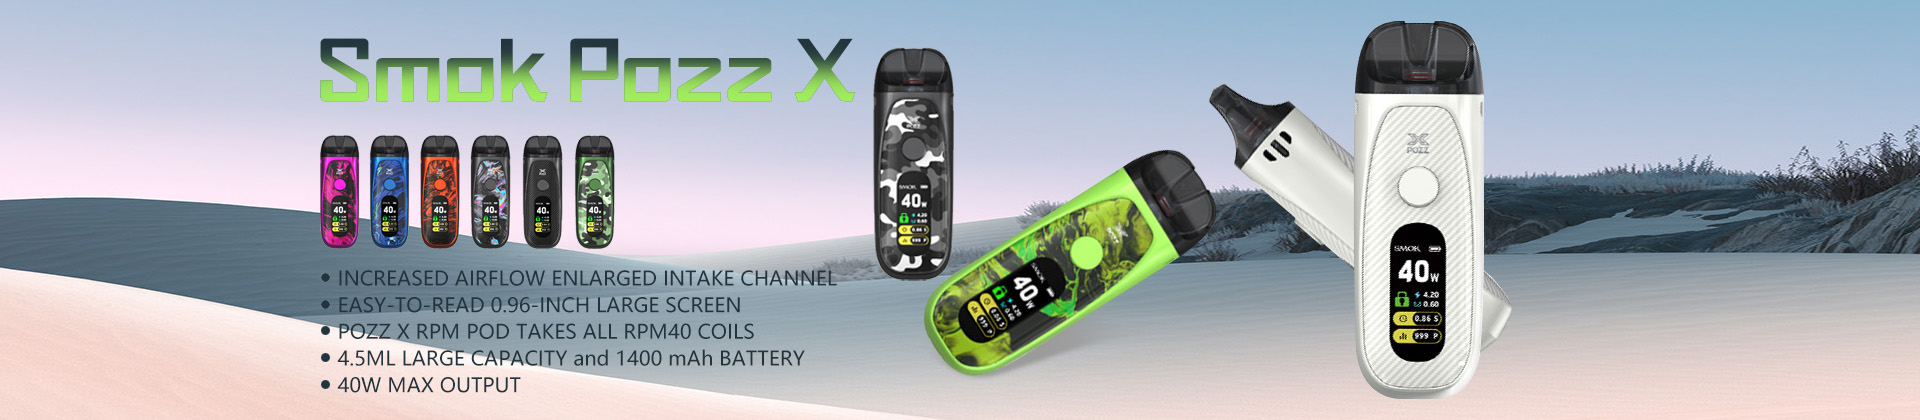 healthcabin - Smok Pozz X Pod System Kit 1400mAh 4.5ml @ just $45.99